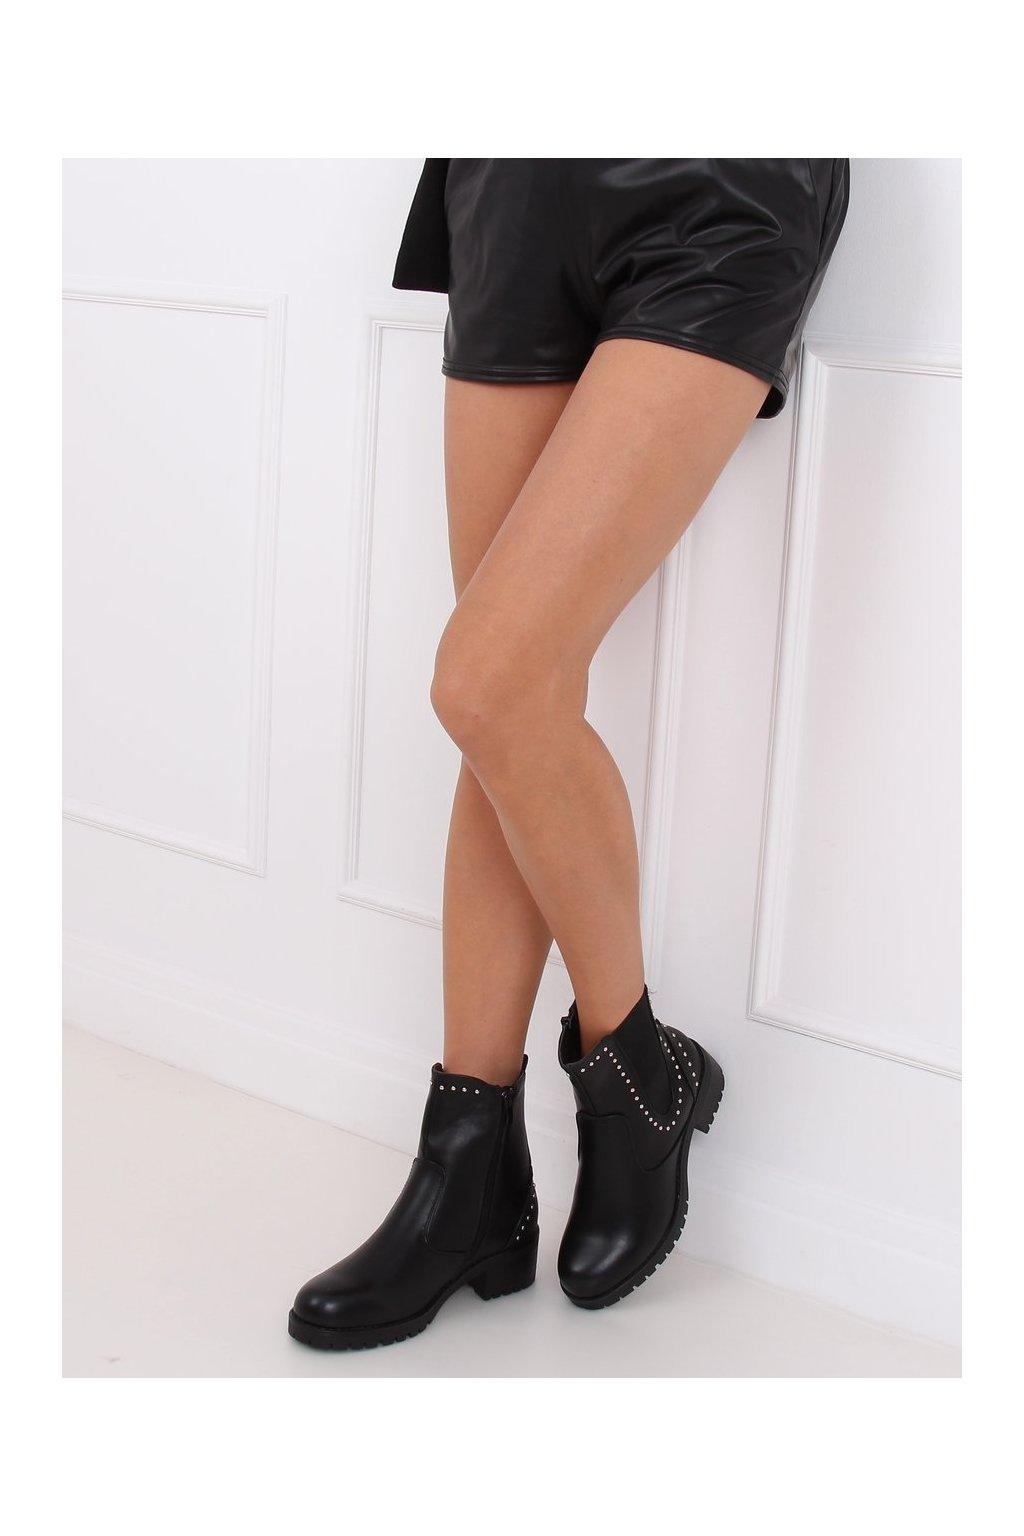 Dámske členkové topánky čierne na širokom podpätku UL309